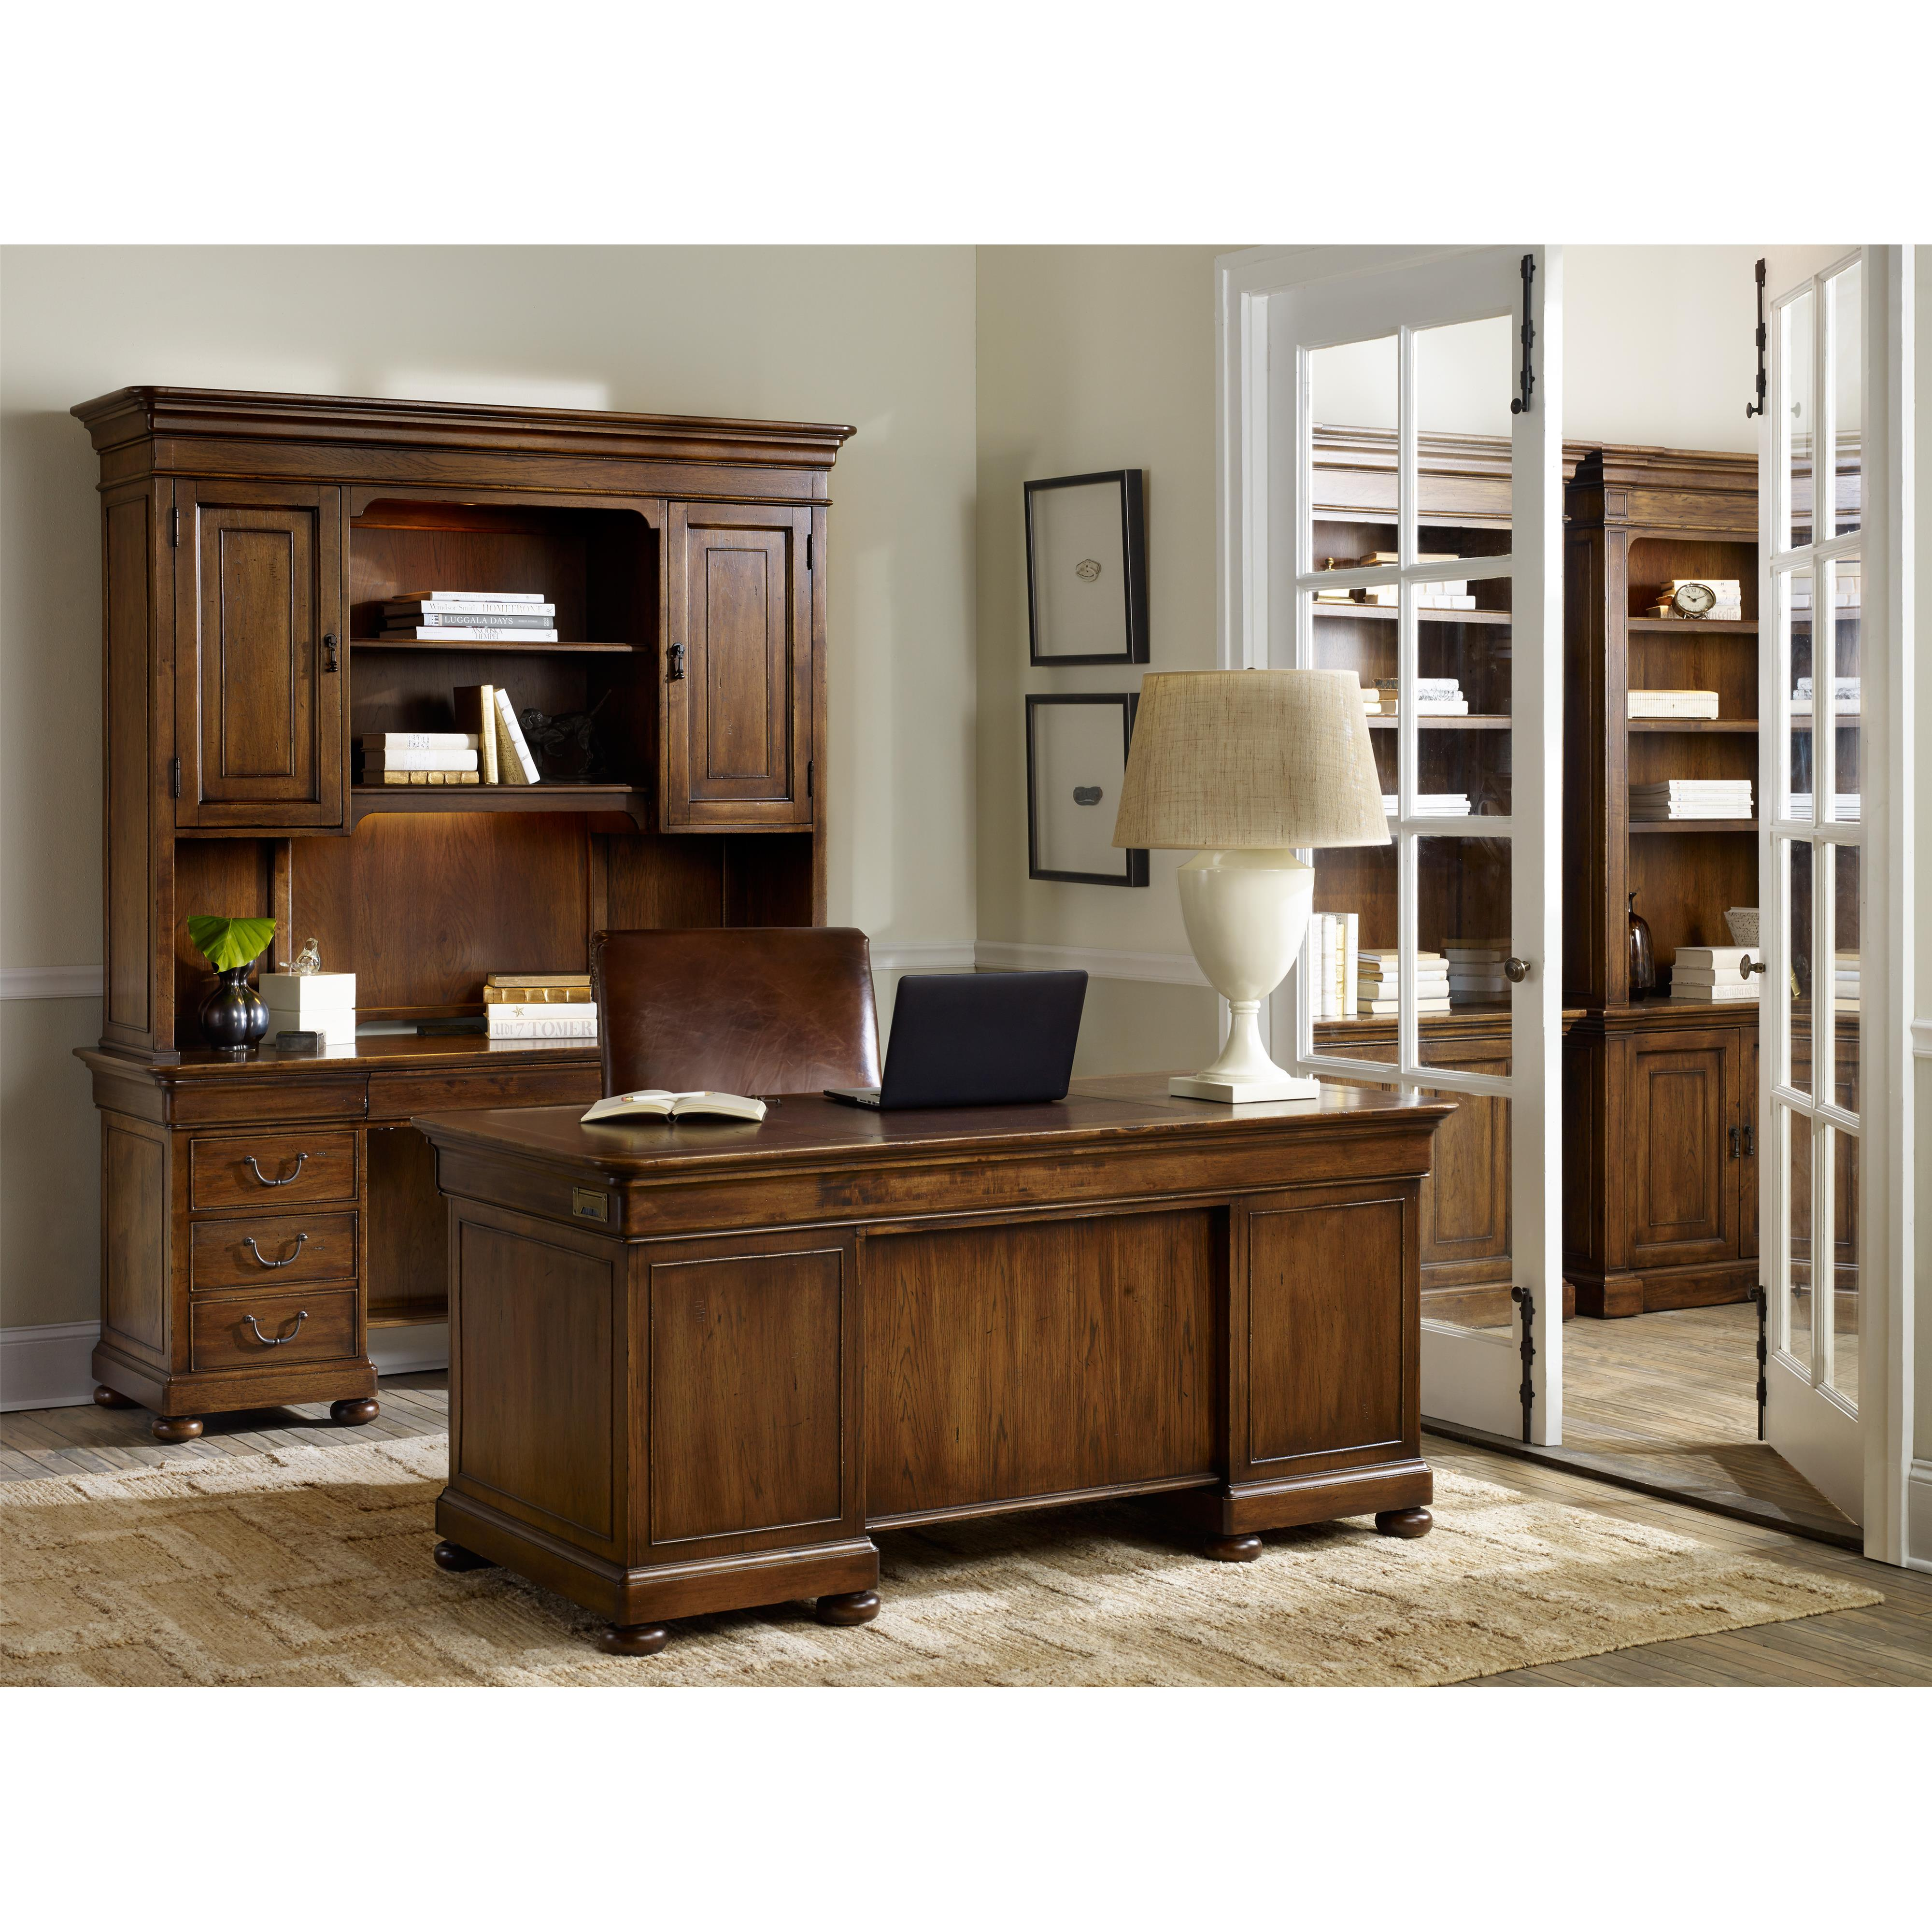 Hooker Furniture Archivist Computer Credenza